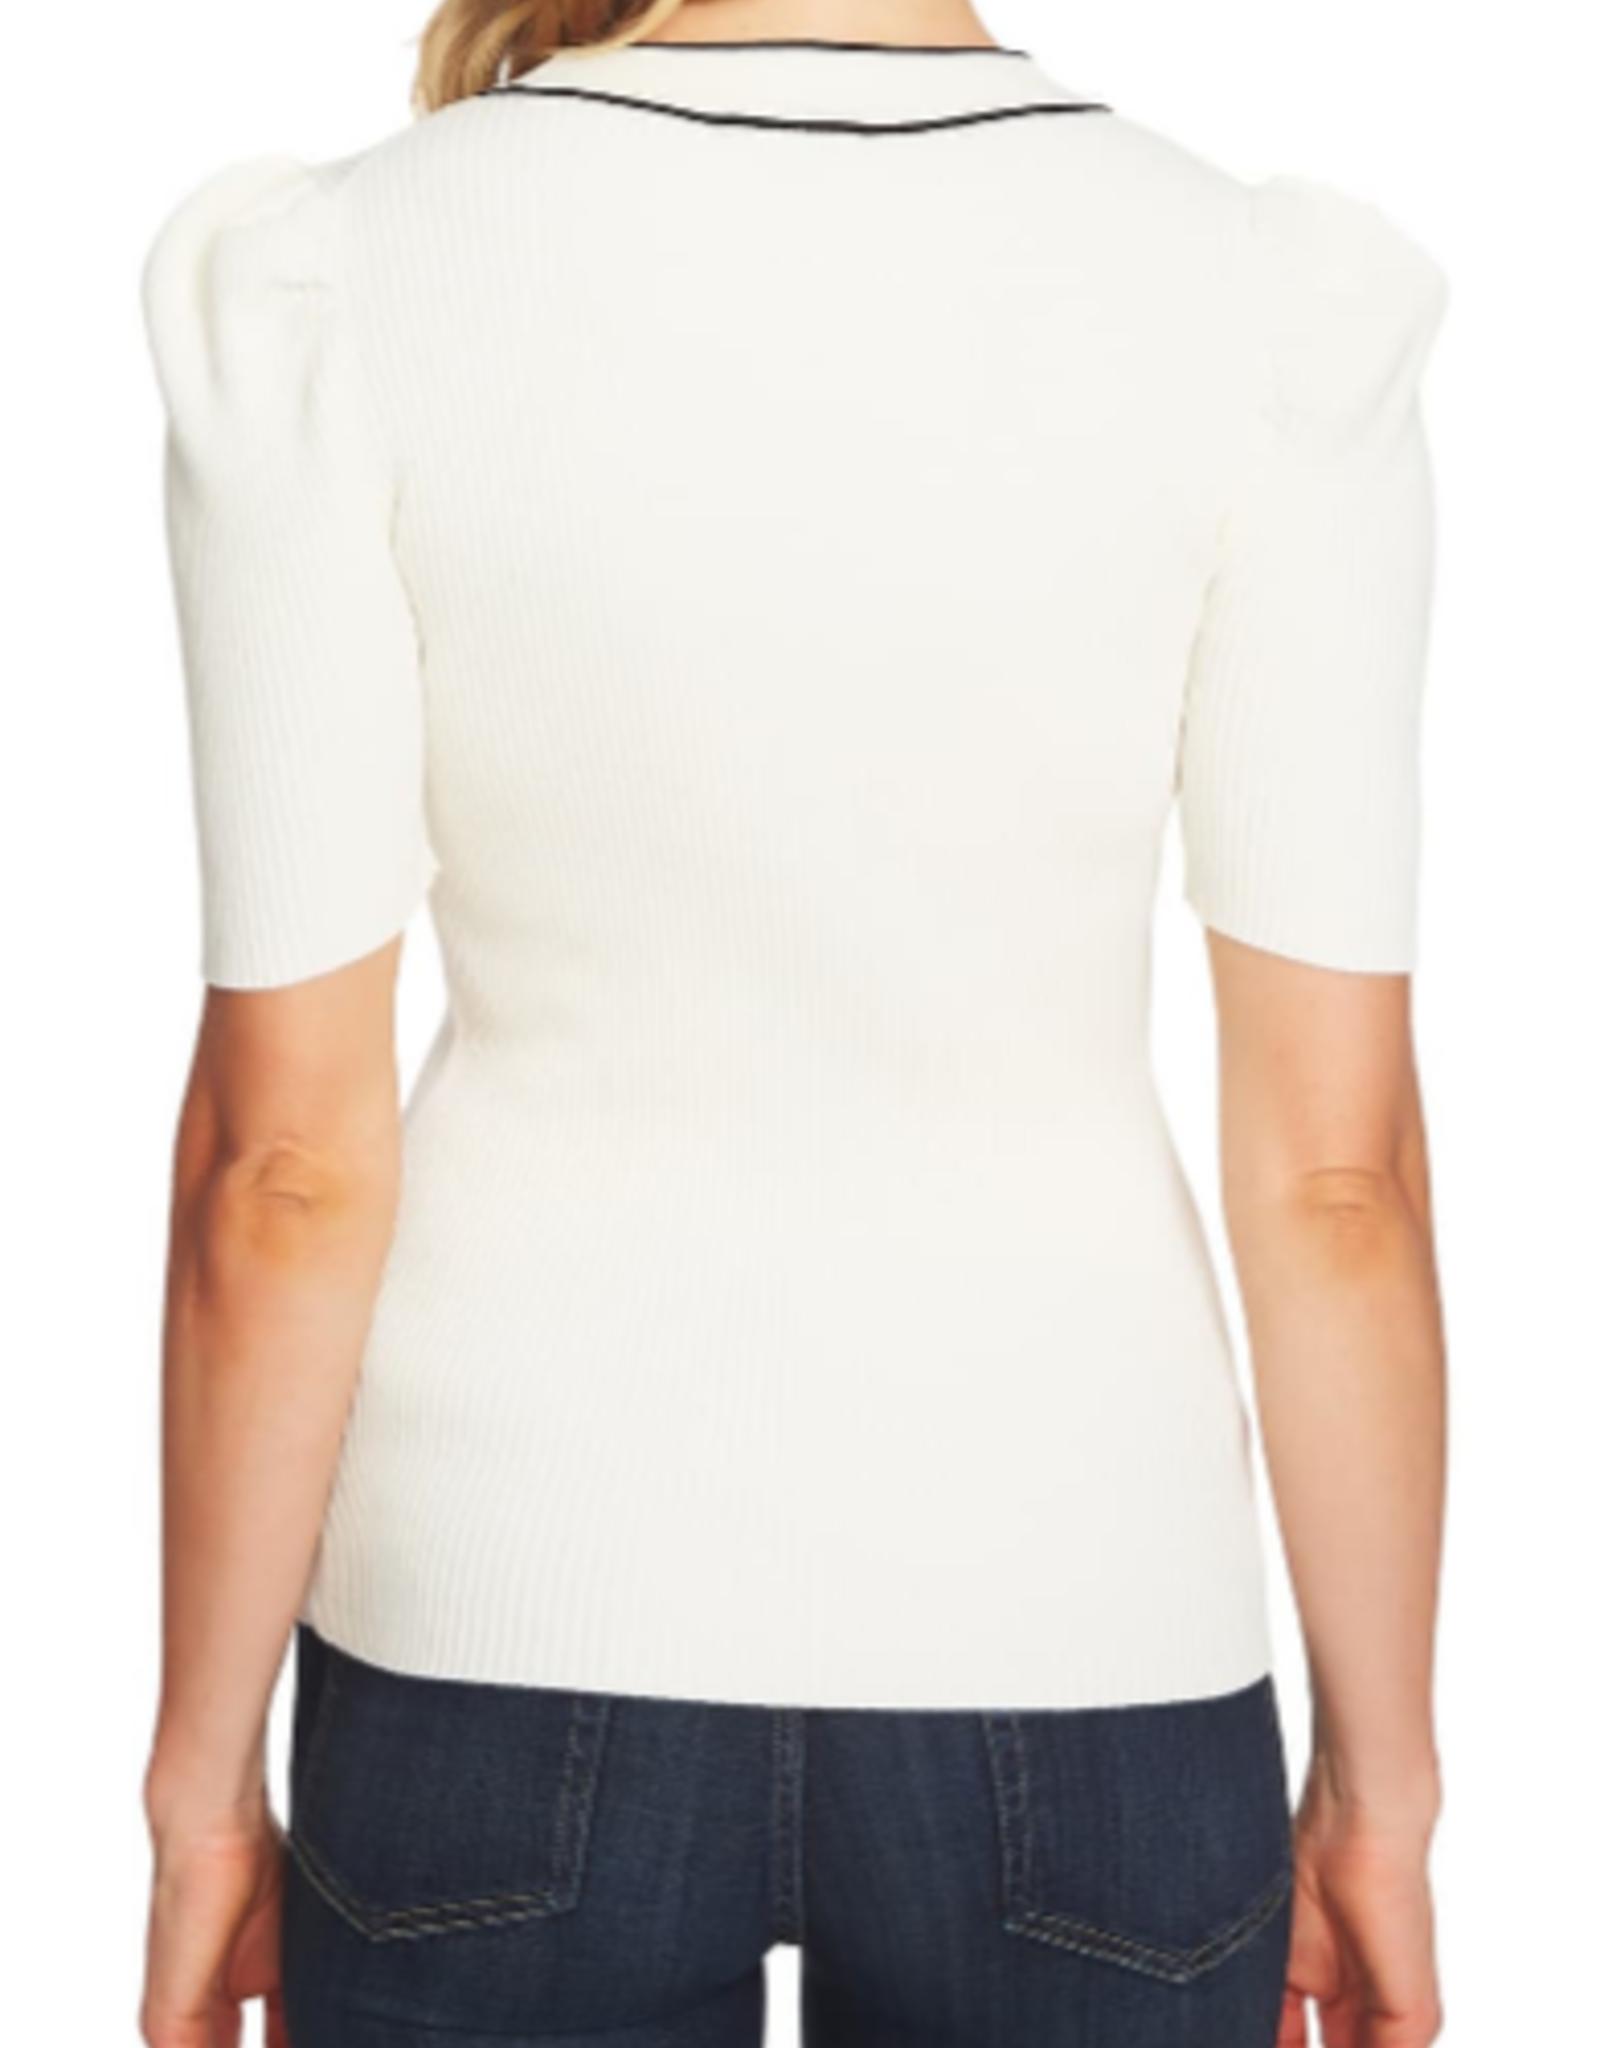 CeCe CeCe Bow Neck Puff Sleeve Sweater Size XXL